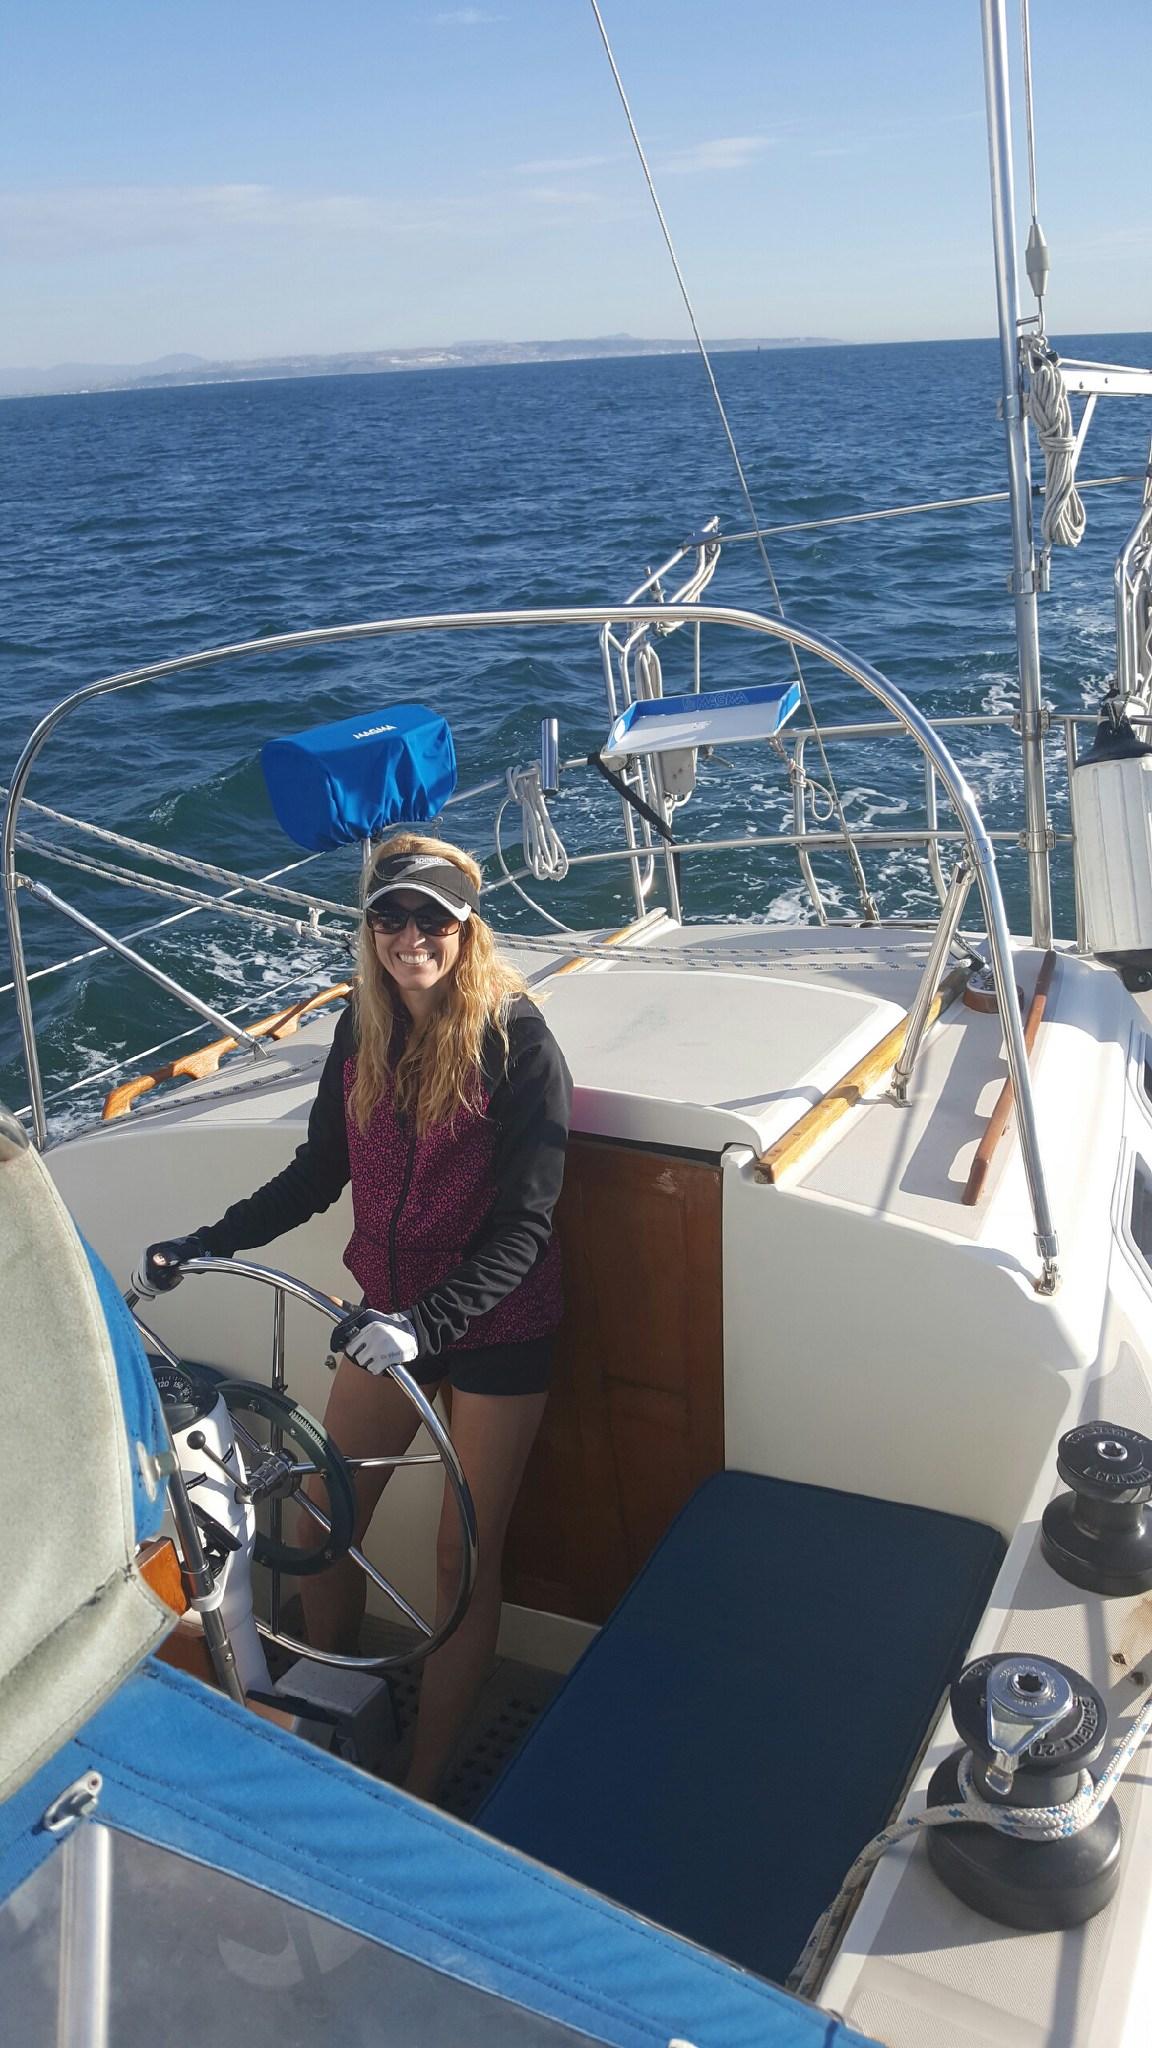 Laura sailing.JPG